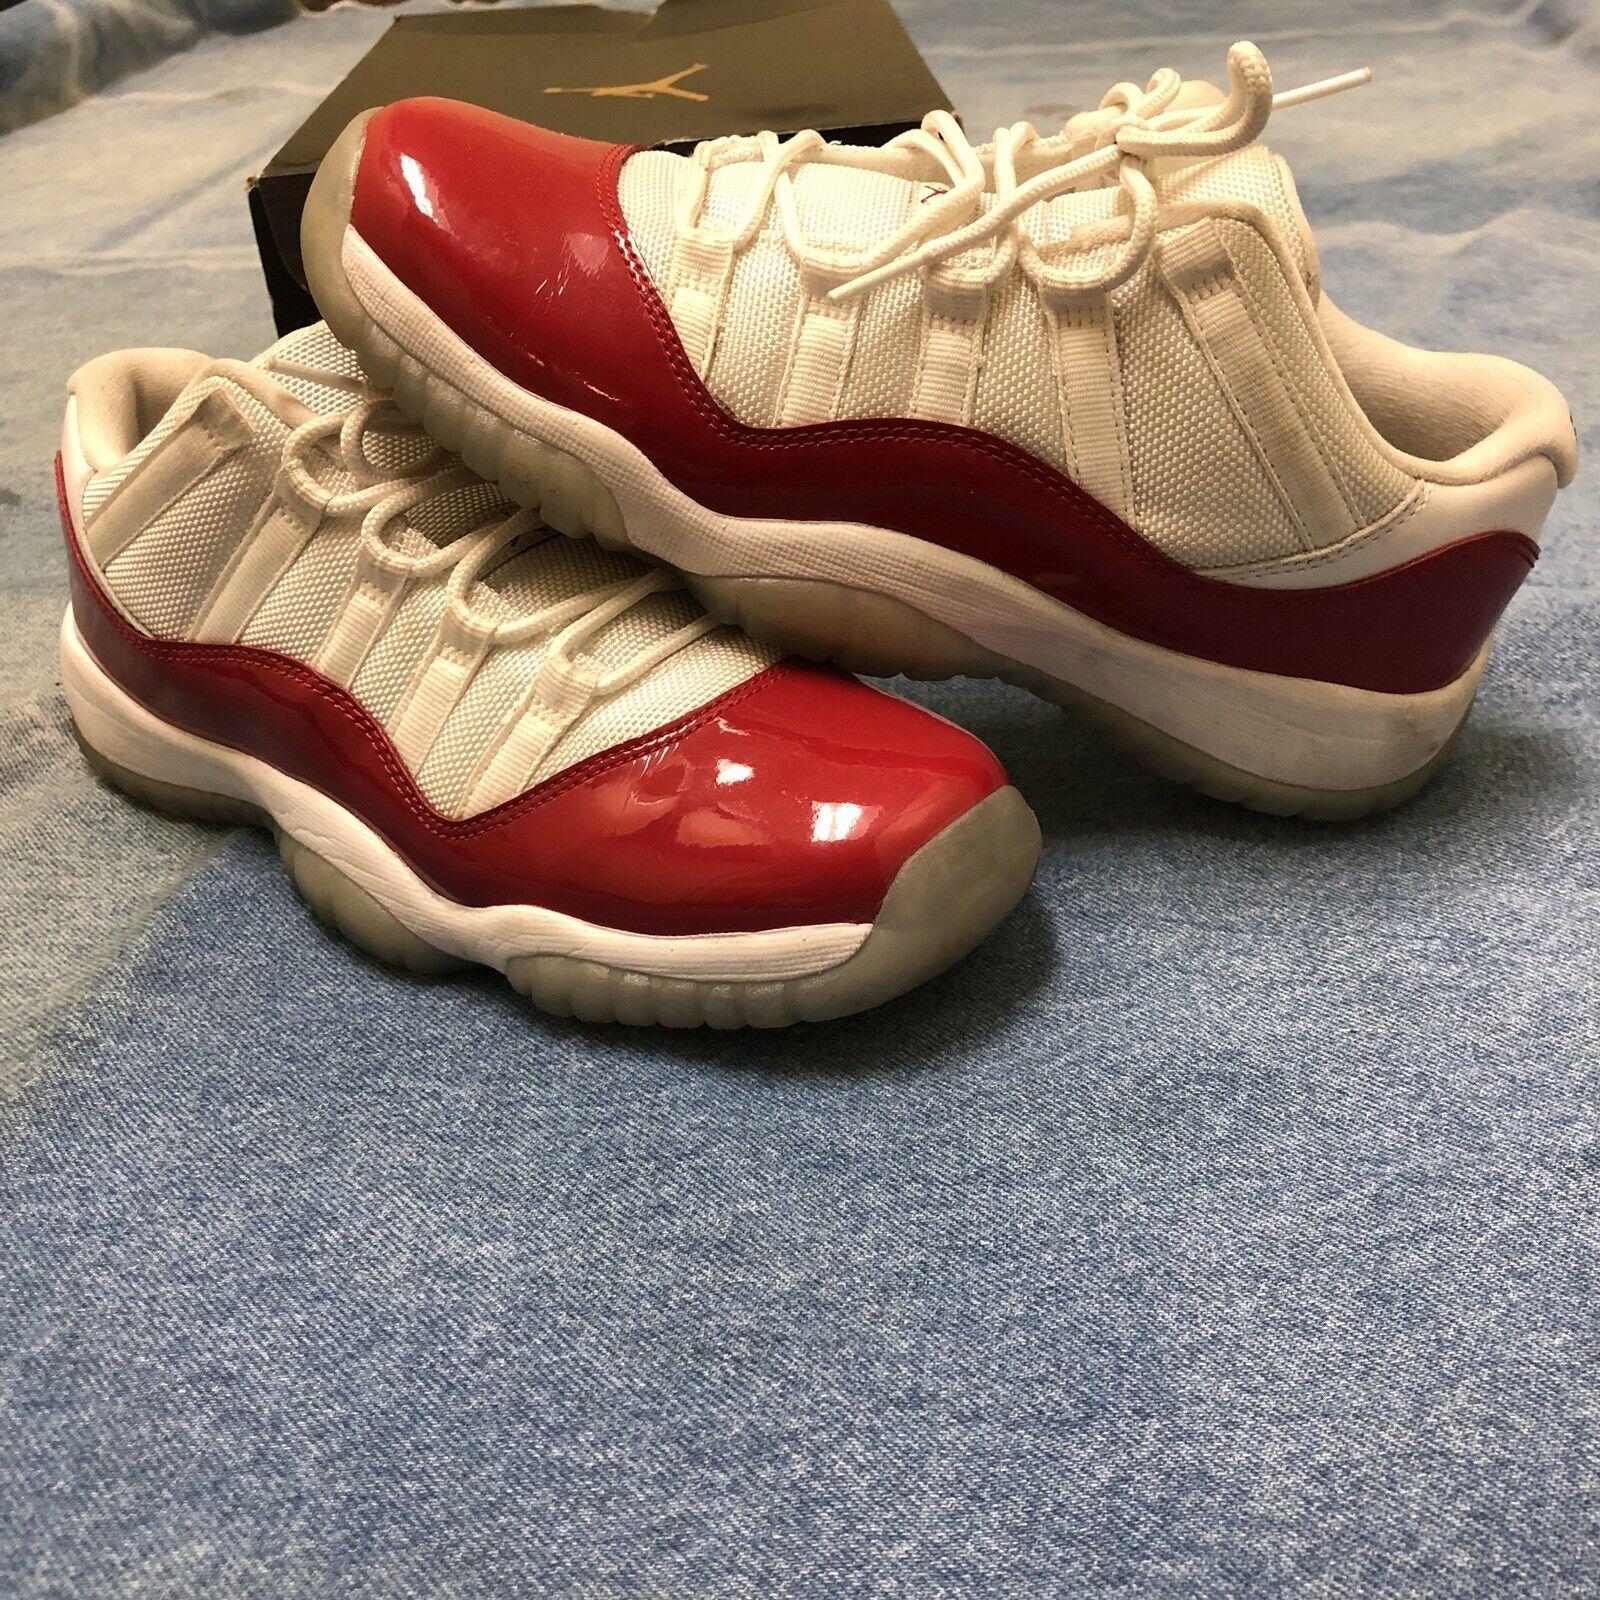 Nike Air Jordan 11 XI Retro Low BG Cherry Varsity Red 528896-102 SIZE 7Y